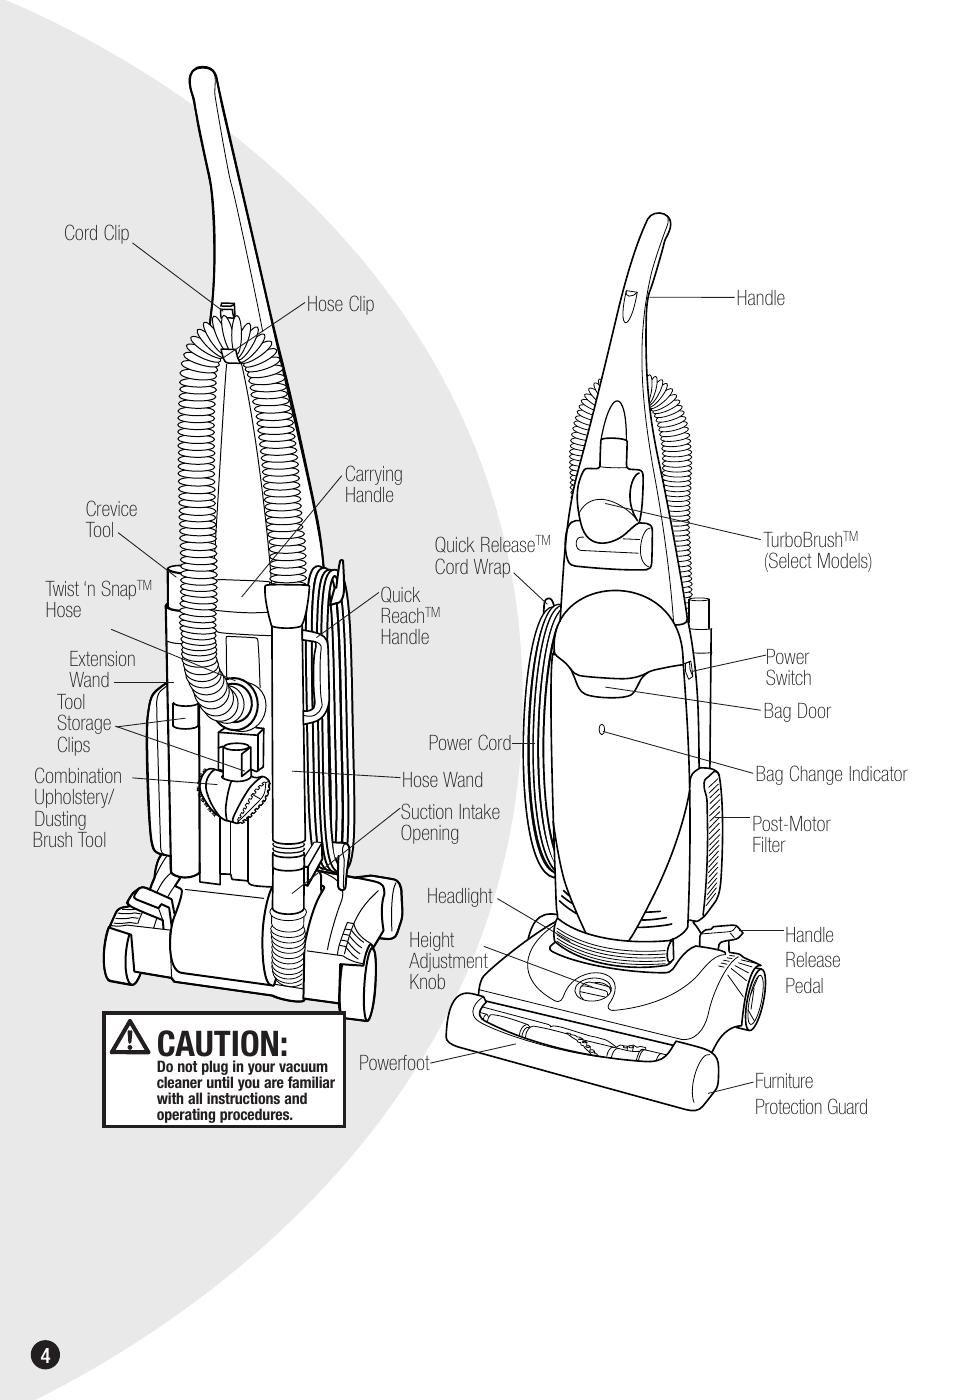 Essential Hose U0026 Cord Wrap Manual Guide